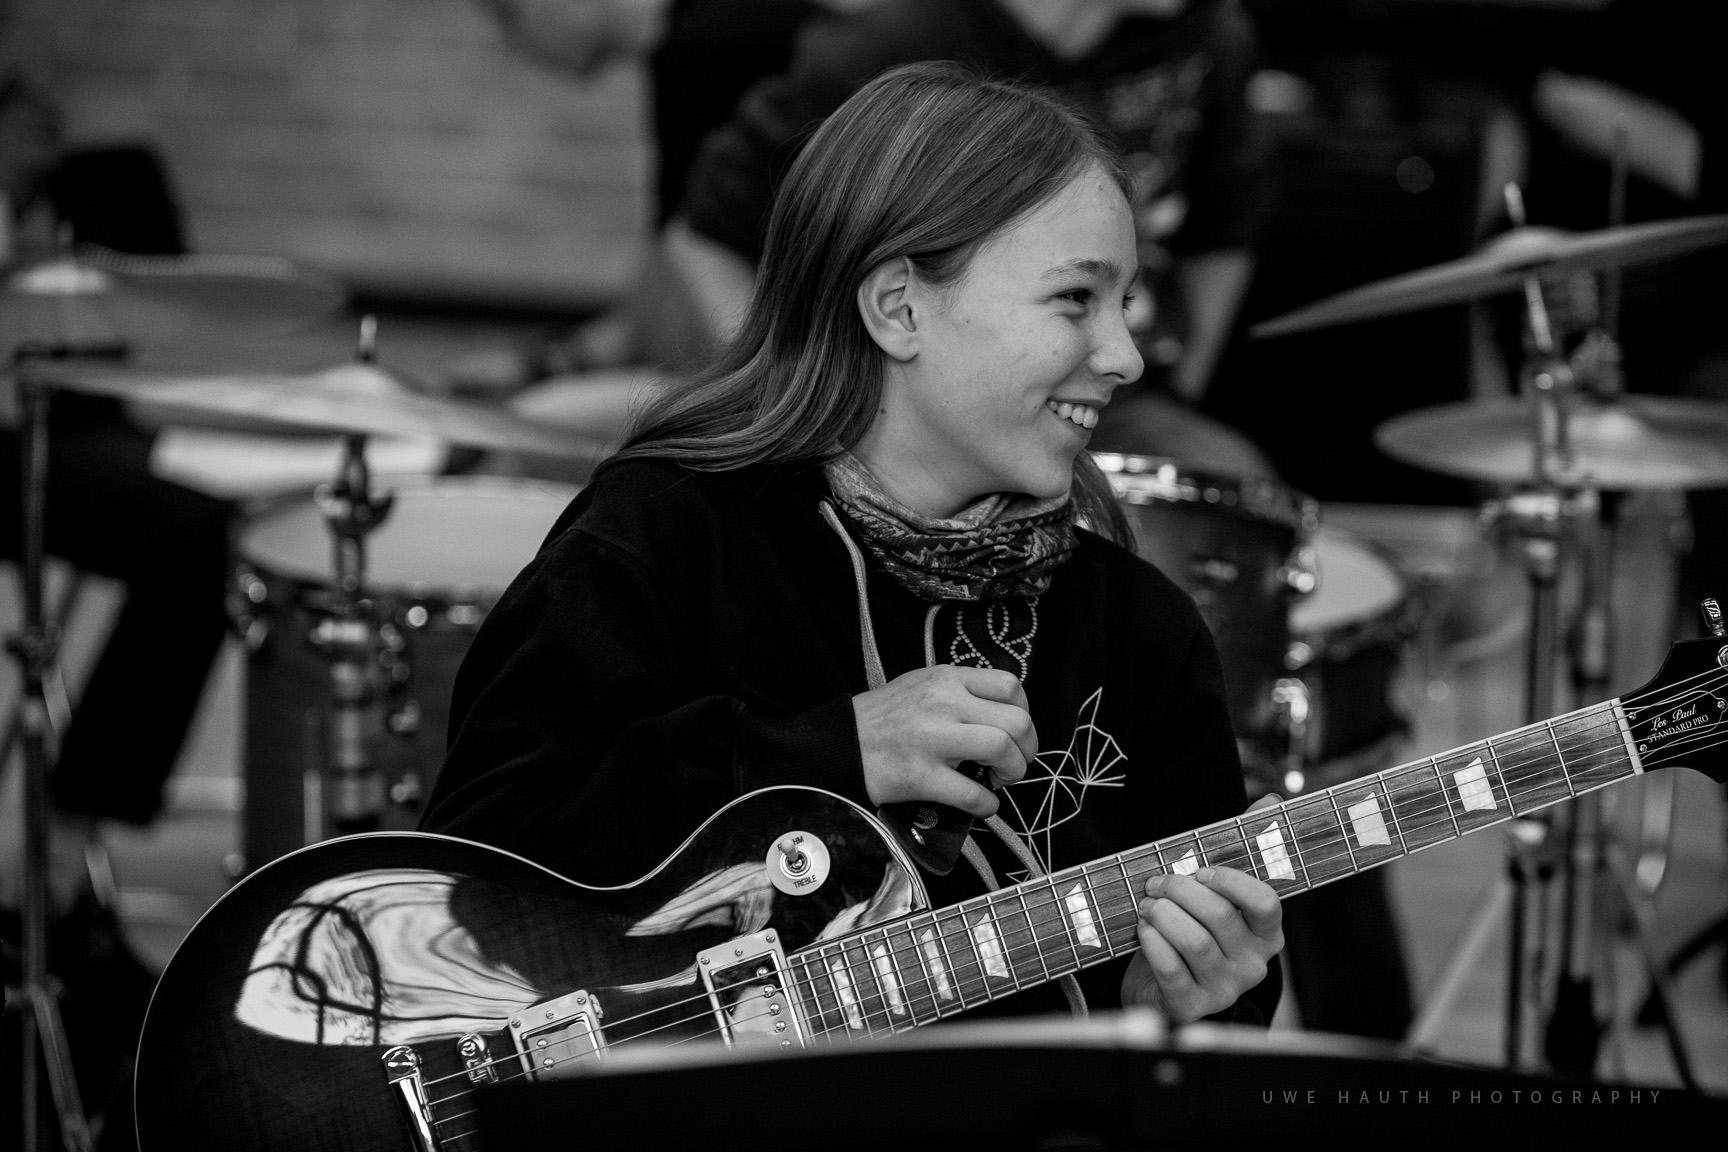 Gitarrenspielerin des Landesjugendjazzorchesters